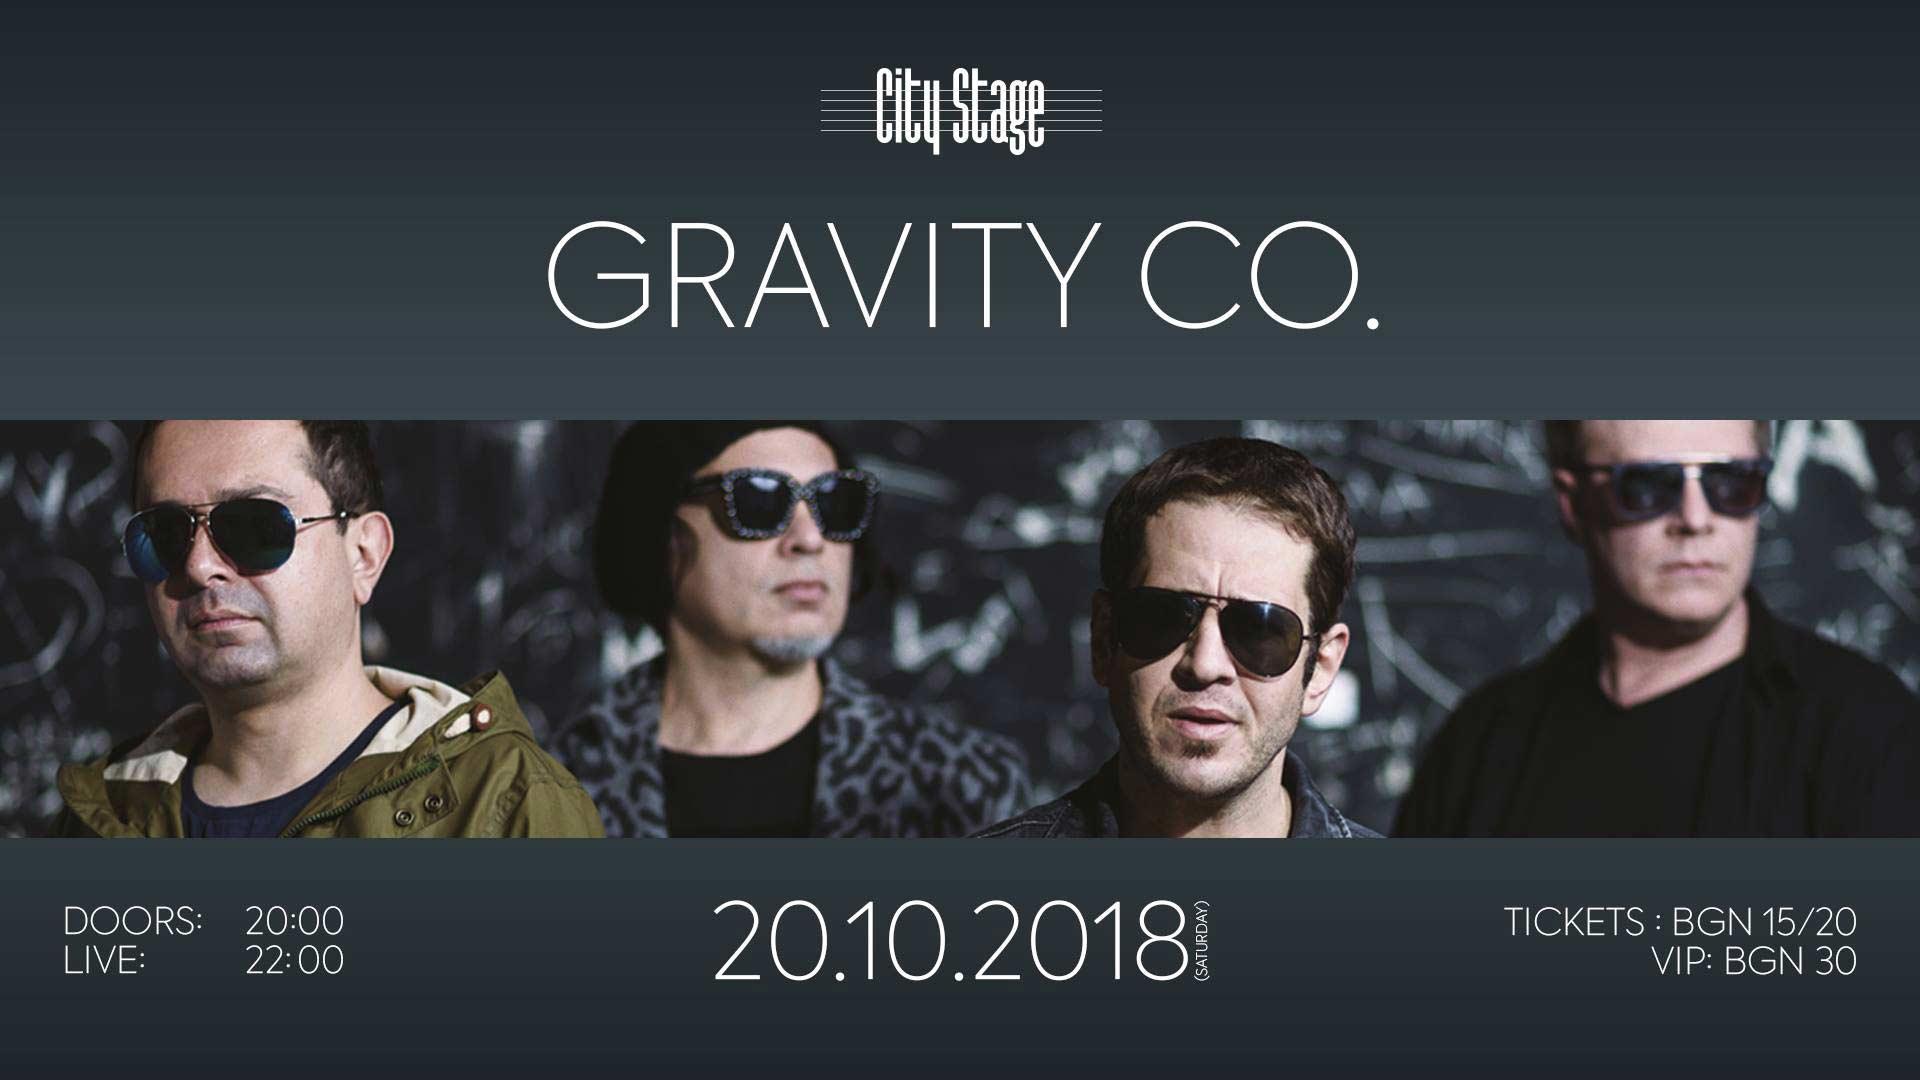 Gravity Co. 20.10.2018г. City Stage